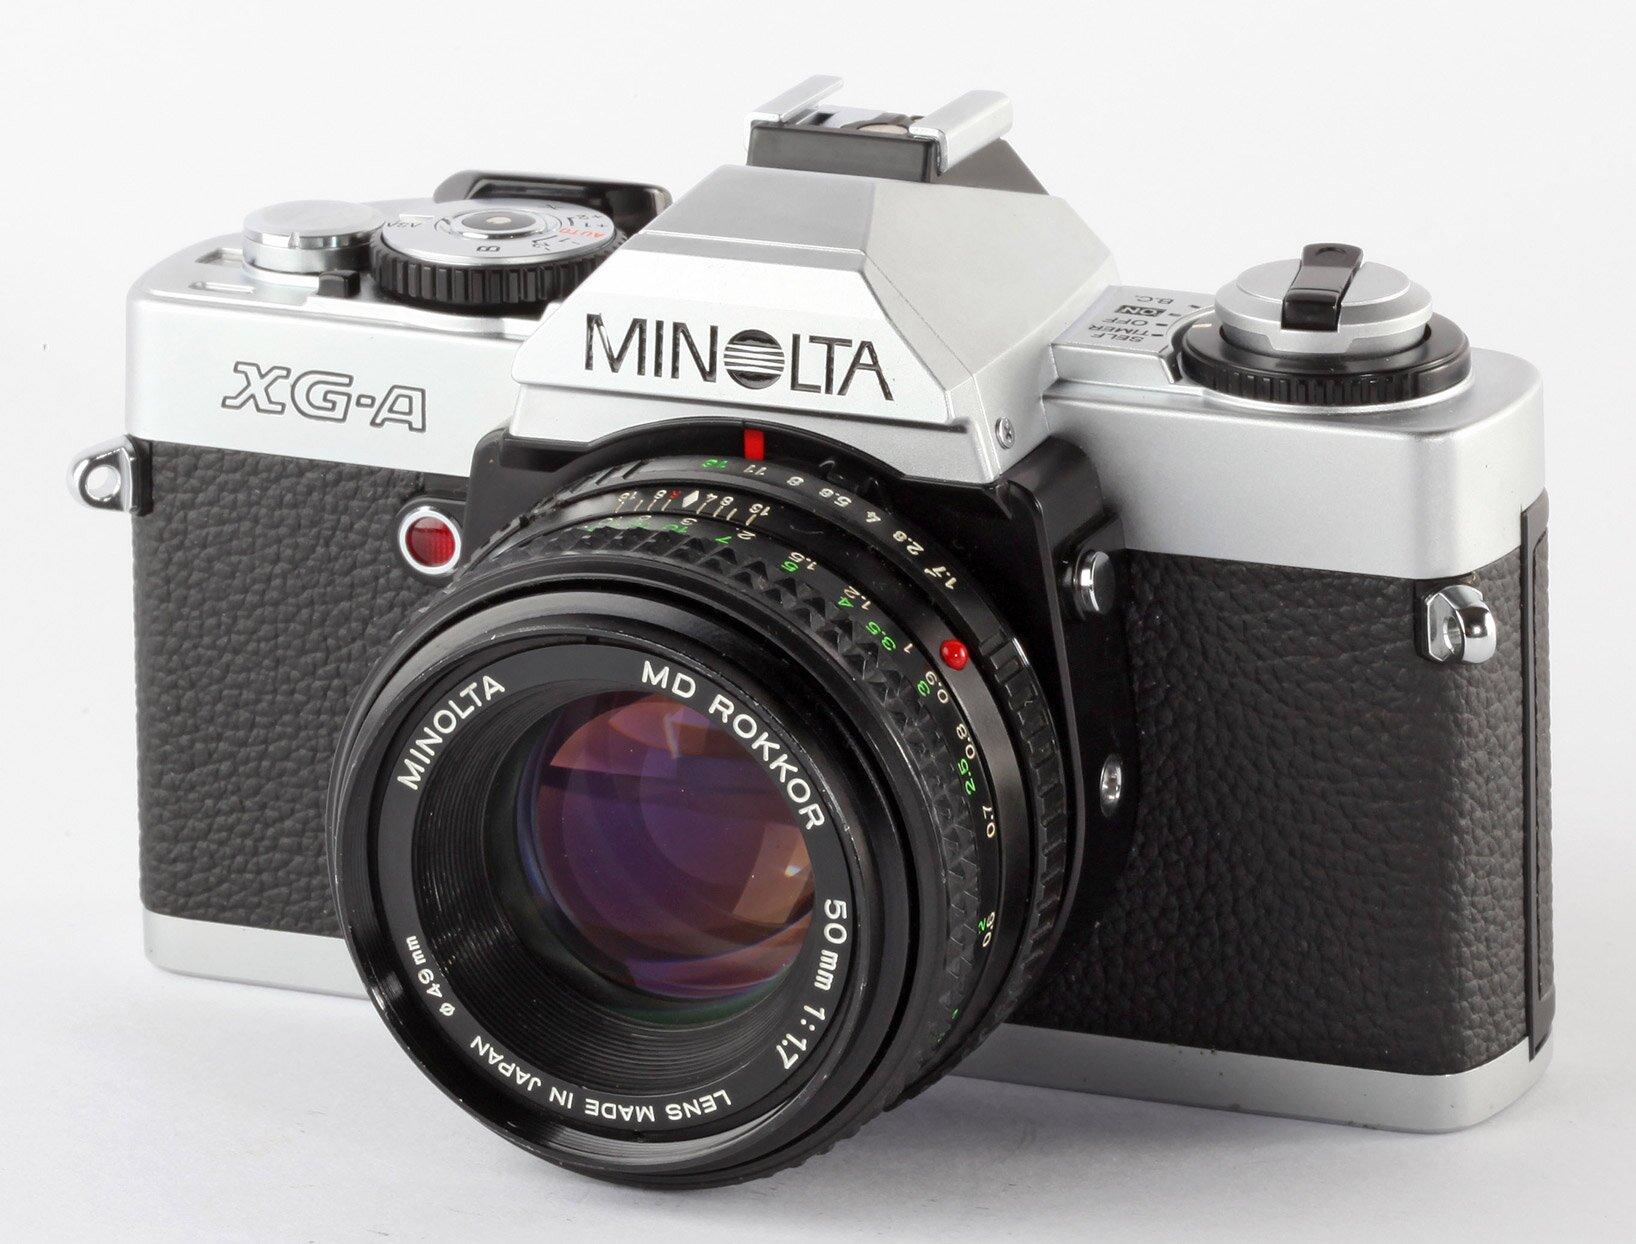 Minolta XG-A Analoge Spiegelreflexkamera